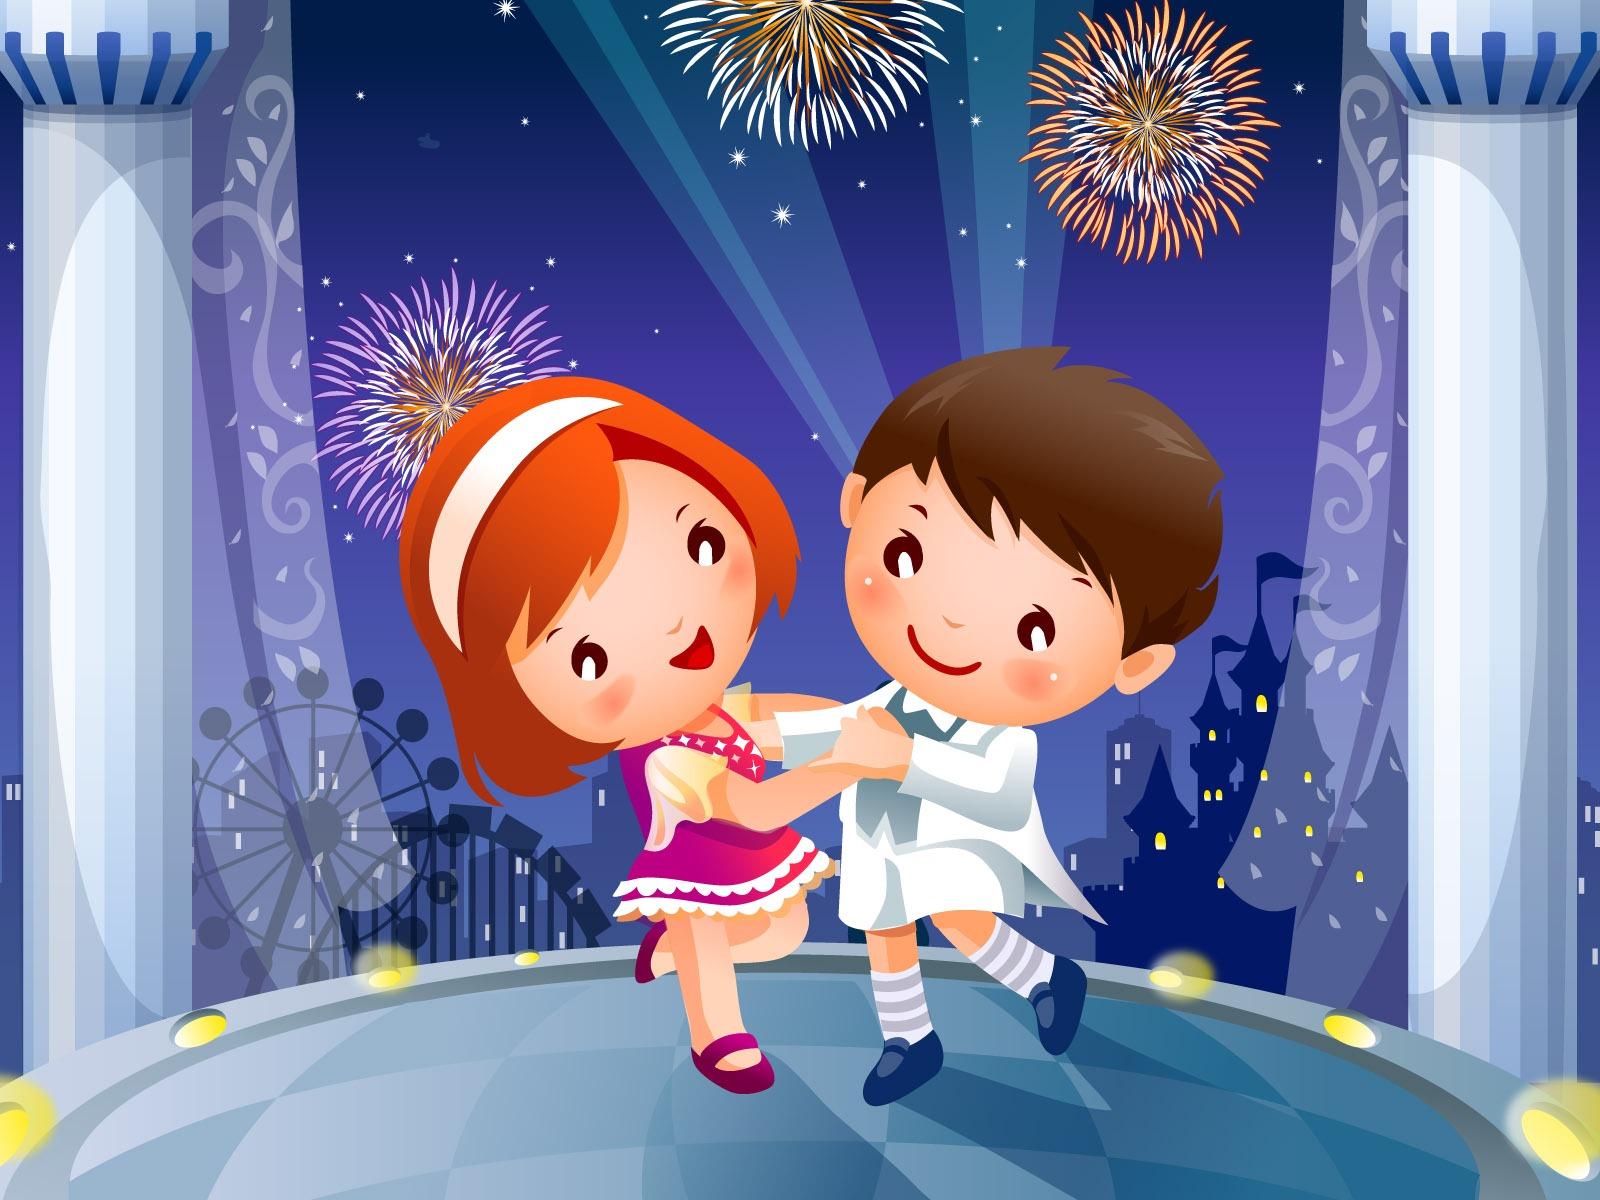 http://thevoloshins.ru/wp-content/uploads/2011/09/1600_1200_20100116095002384039.jpg